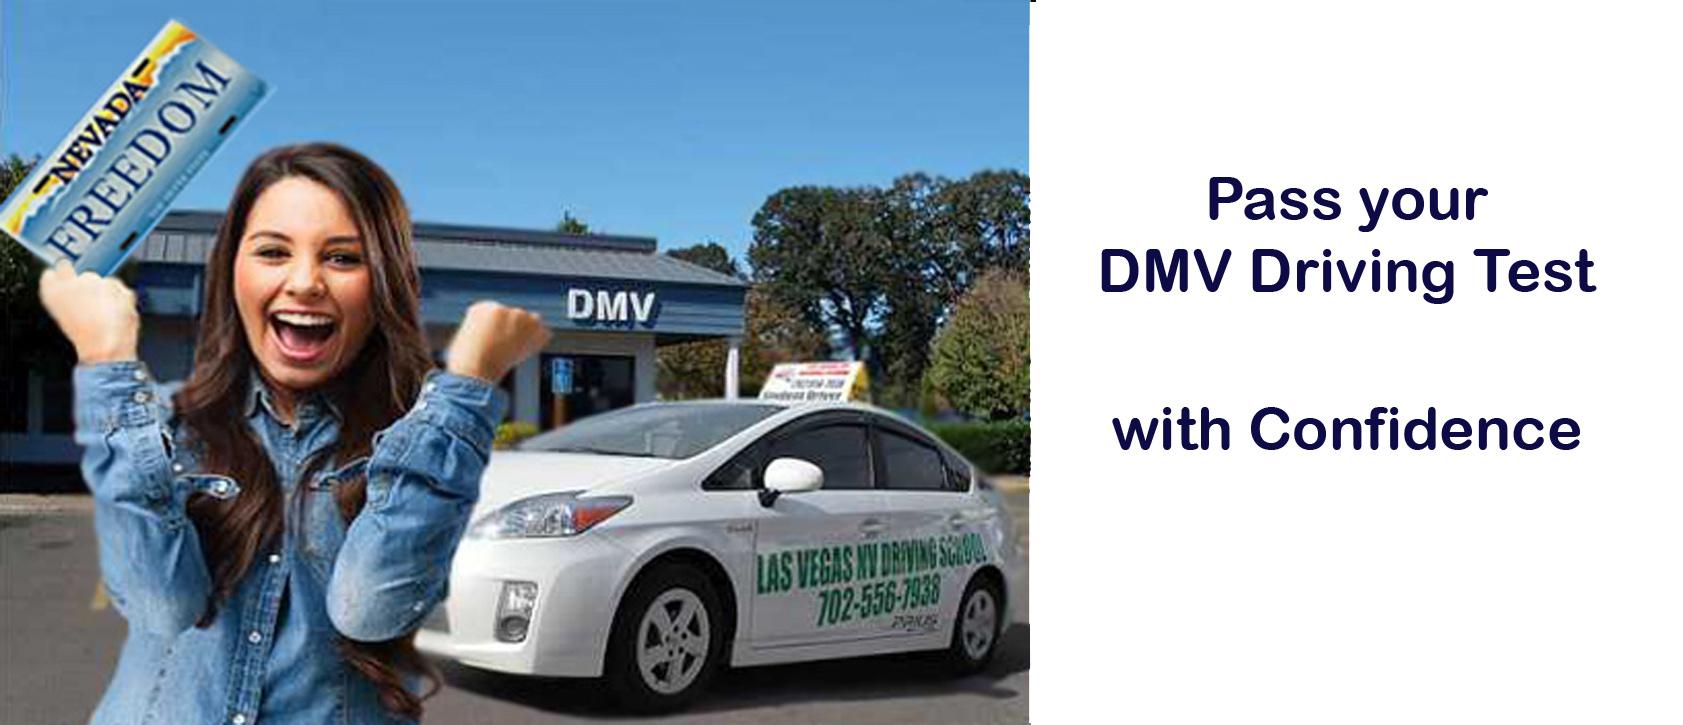 Las Vegas Nv Driving School And Online Driversed Dmv Driving Test